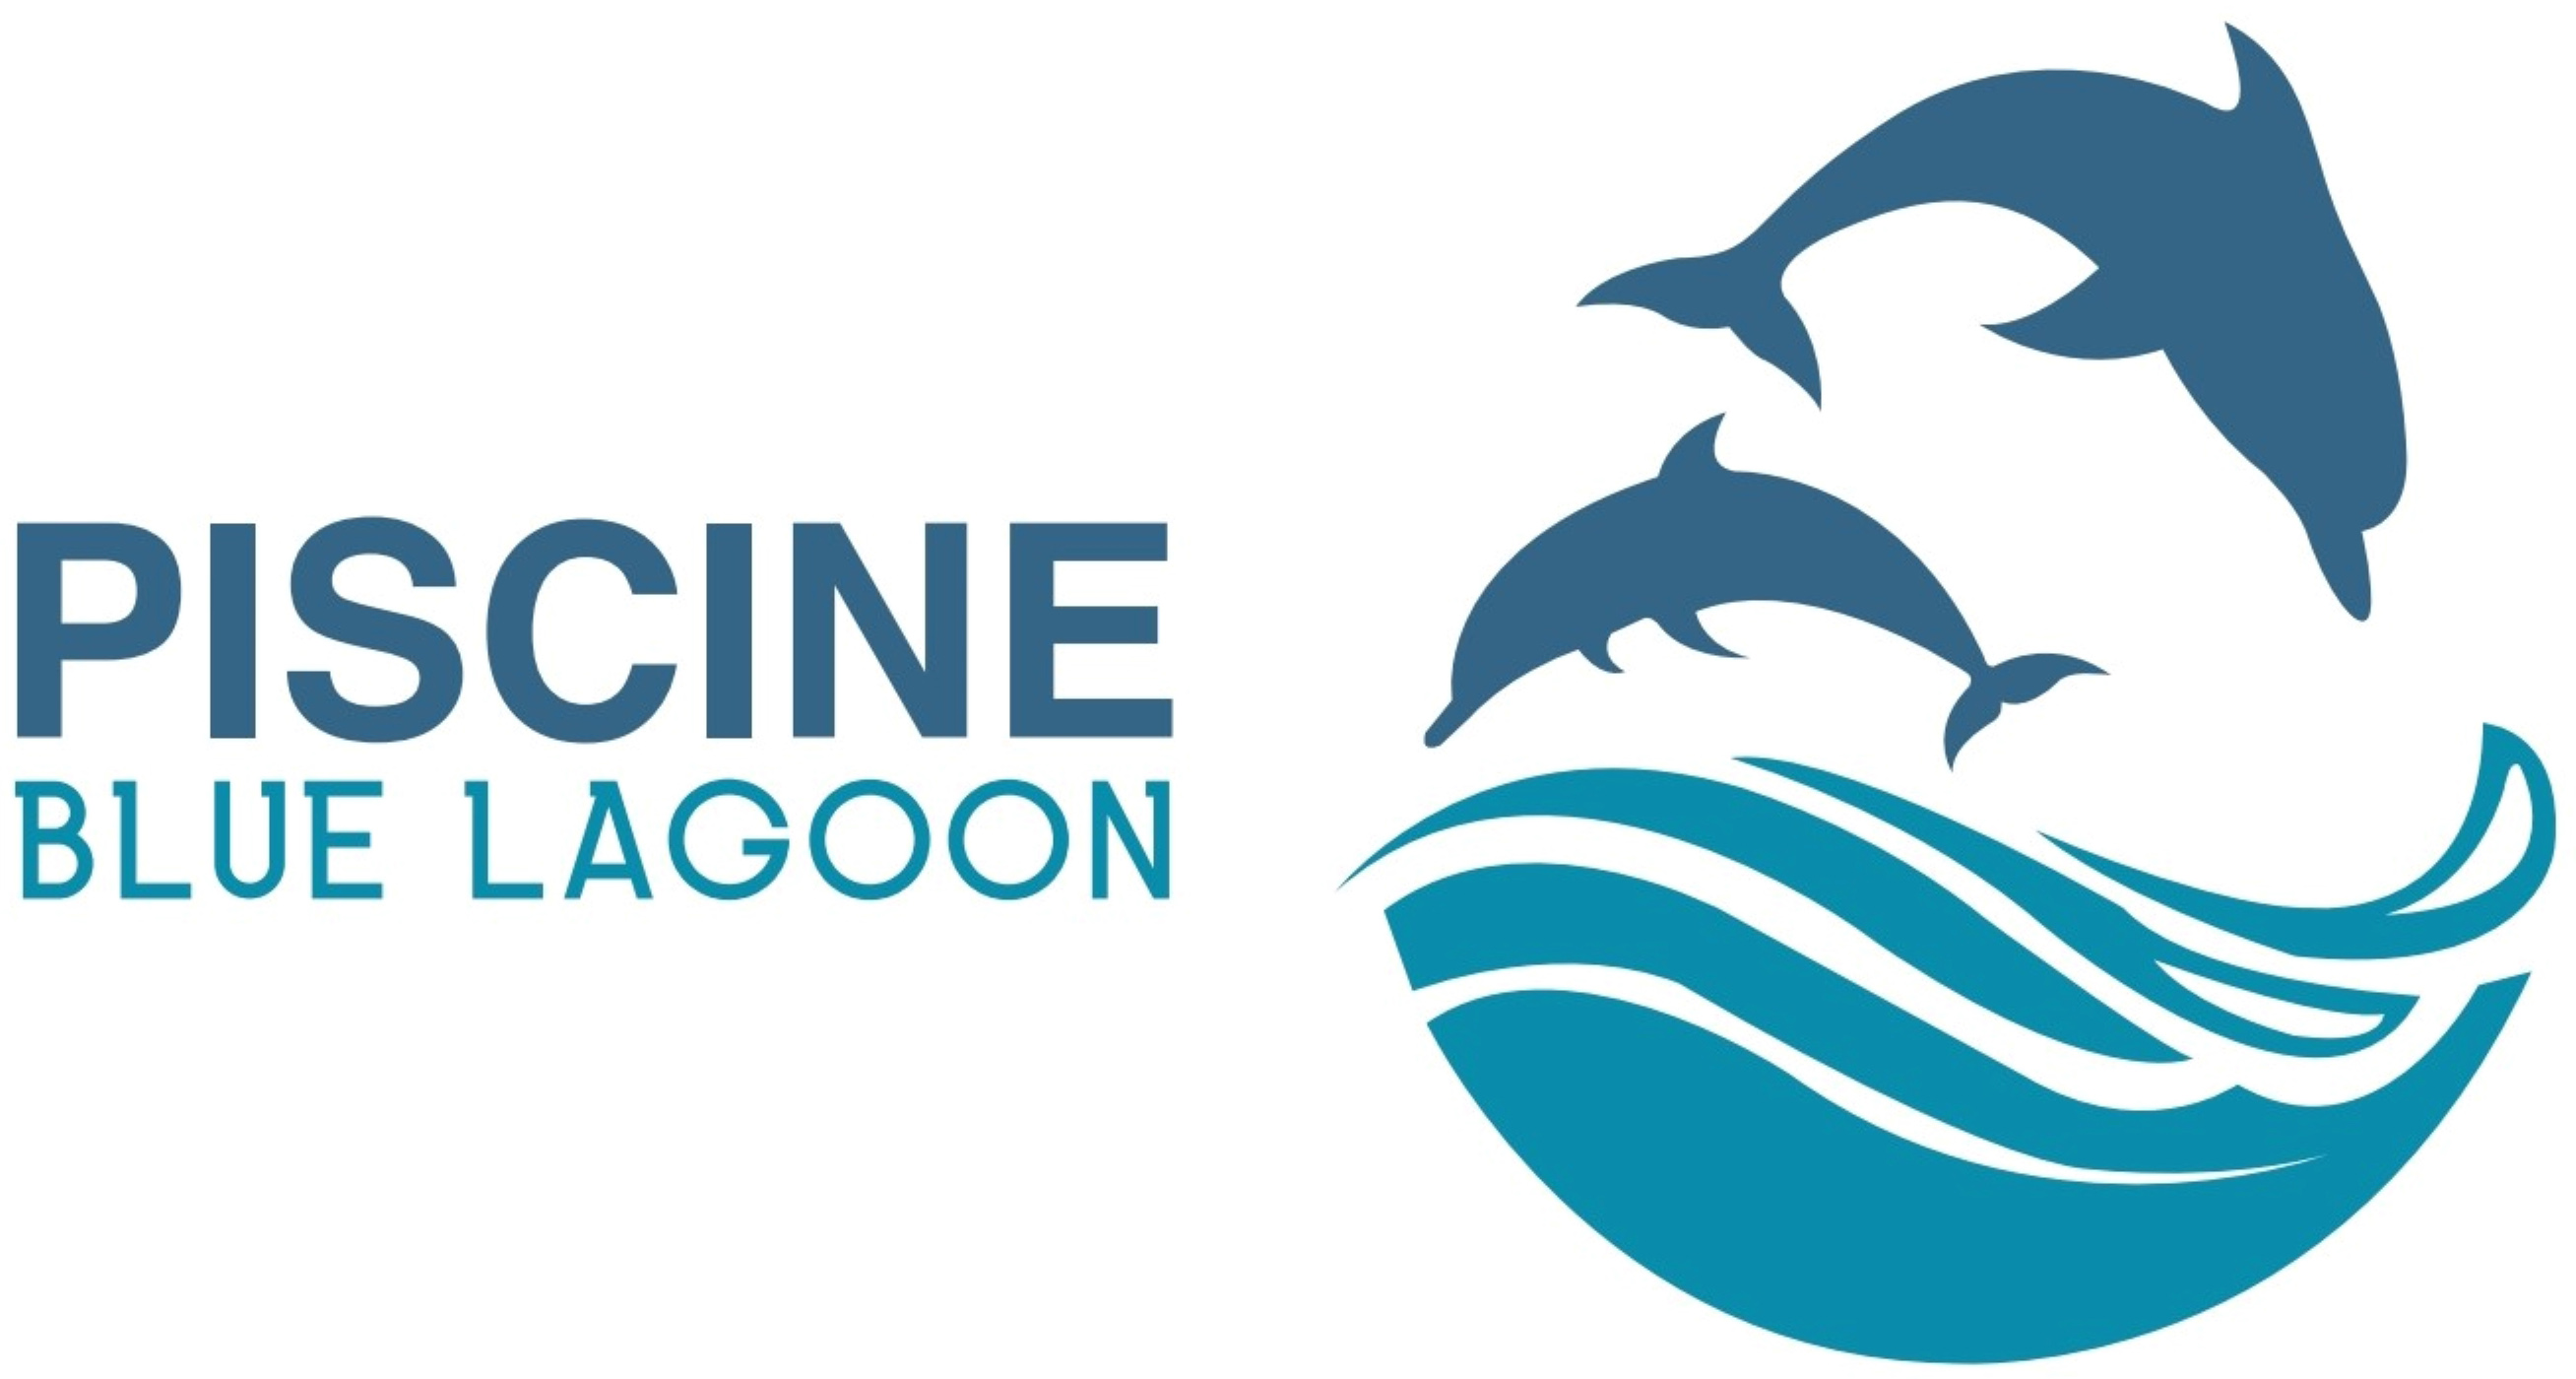 Piscine Blue Lagoon